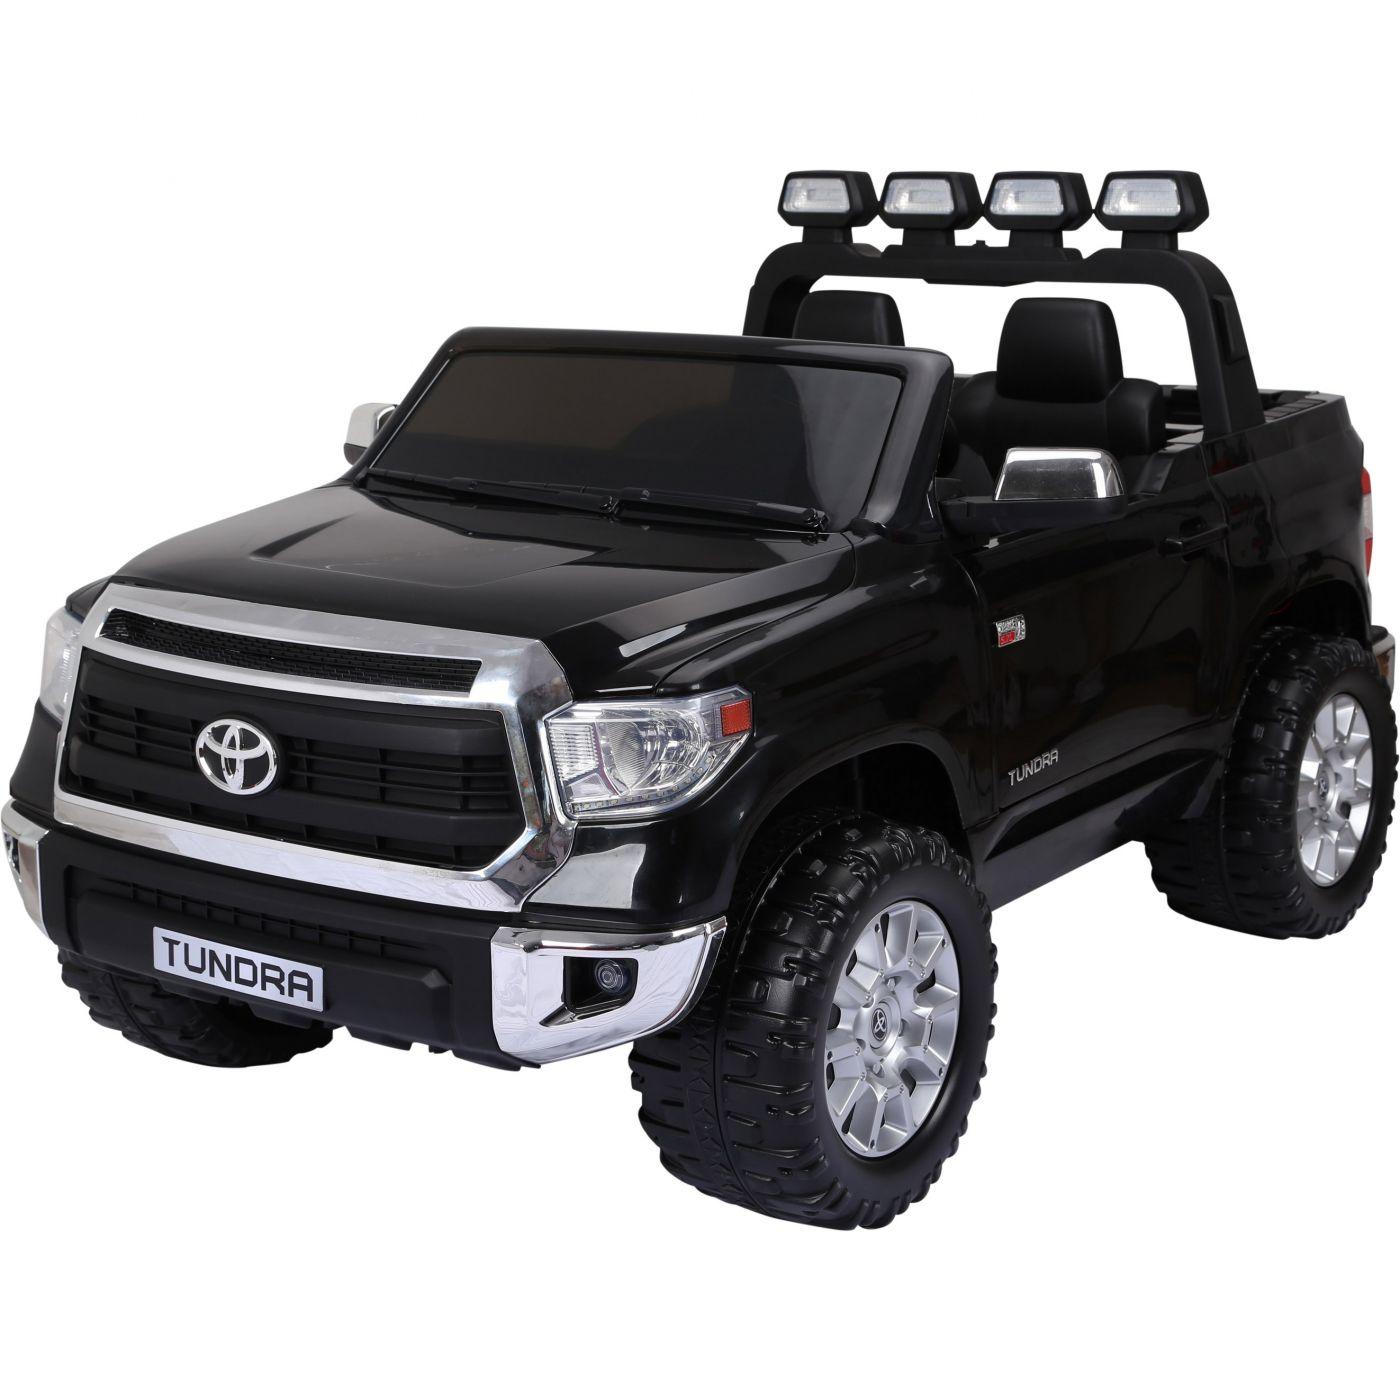 Licensed Toyota Tundra 24v Ride On Children S Electric Jeep Pickup Black